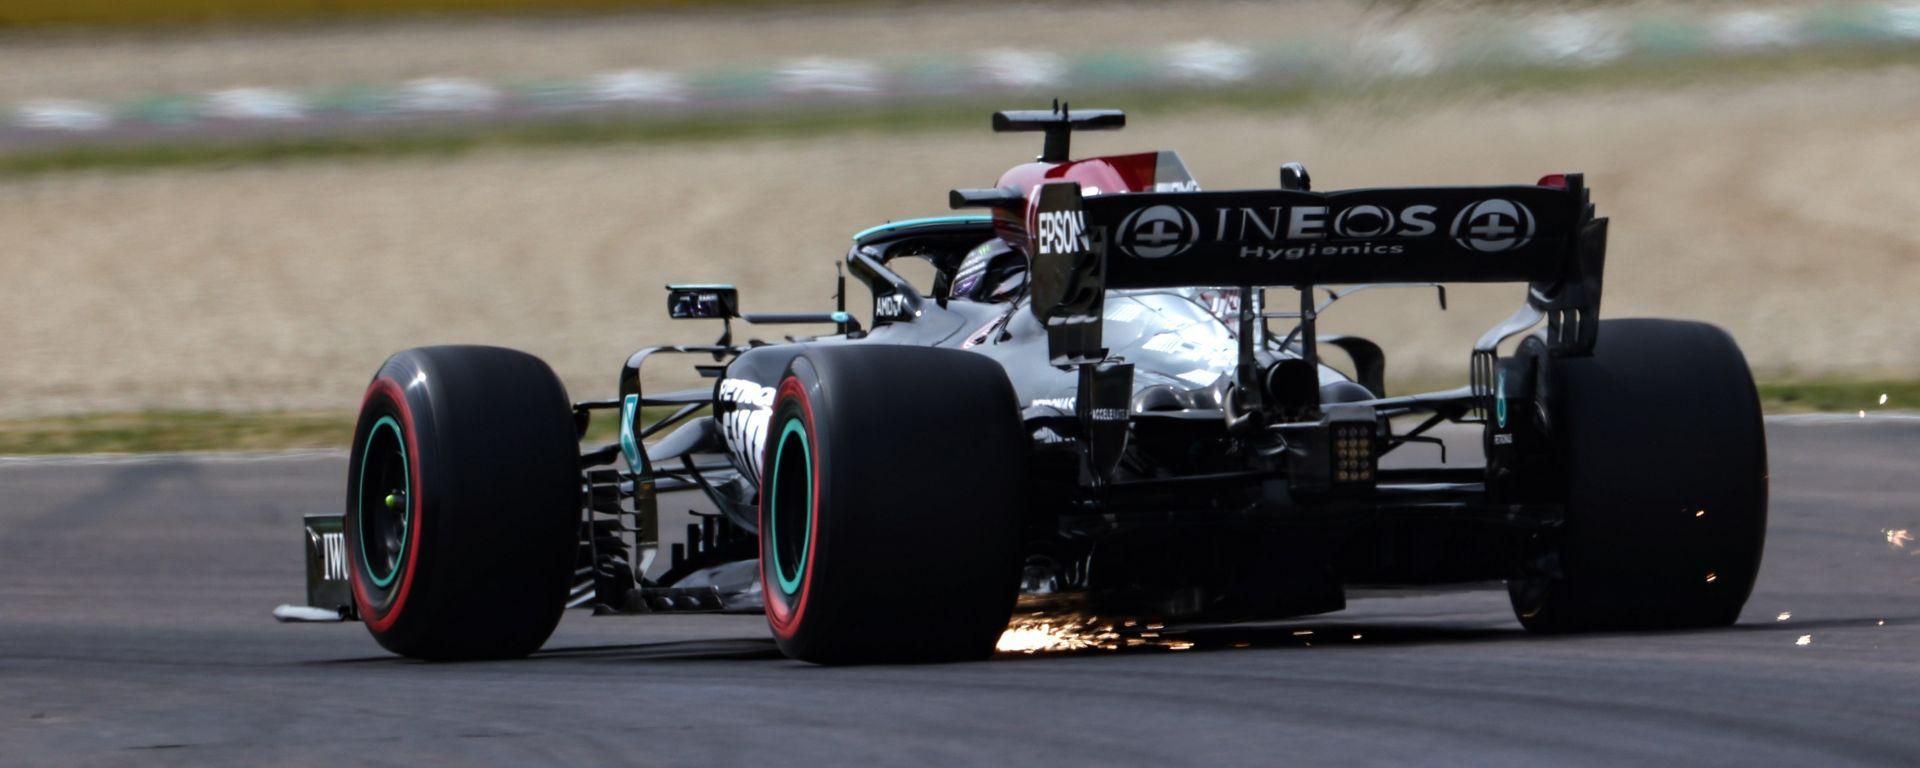 F1 GP Emilia Romagna 2021, Imola: Lewis Hamilton (Mercedes AMG F1)